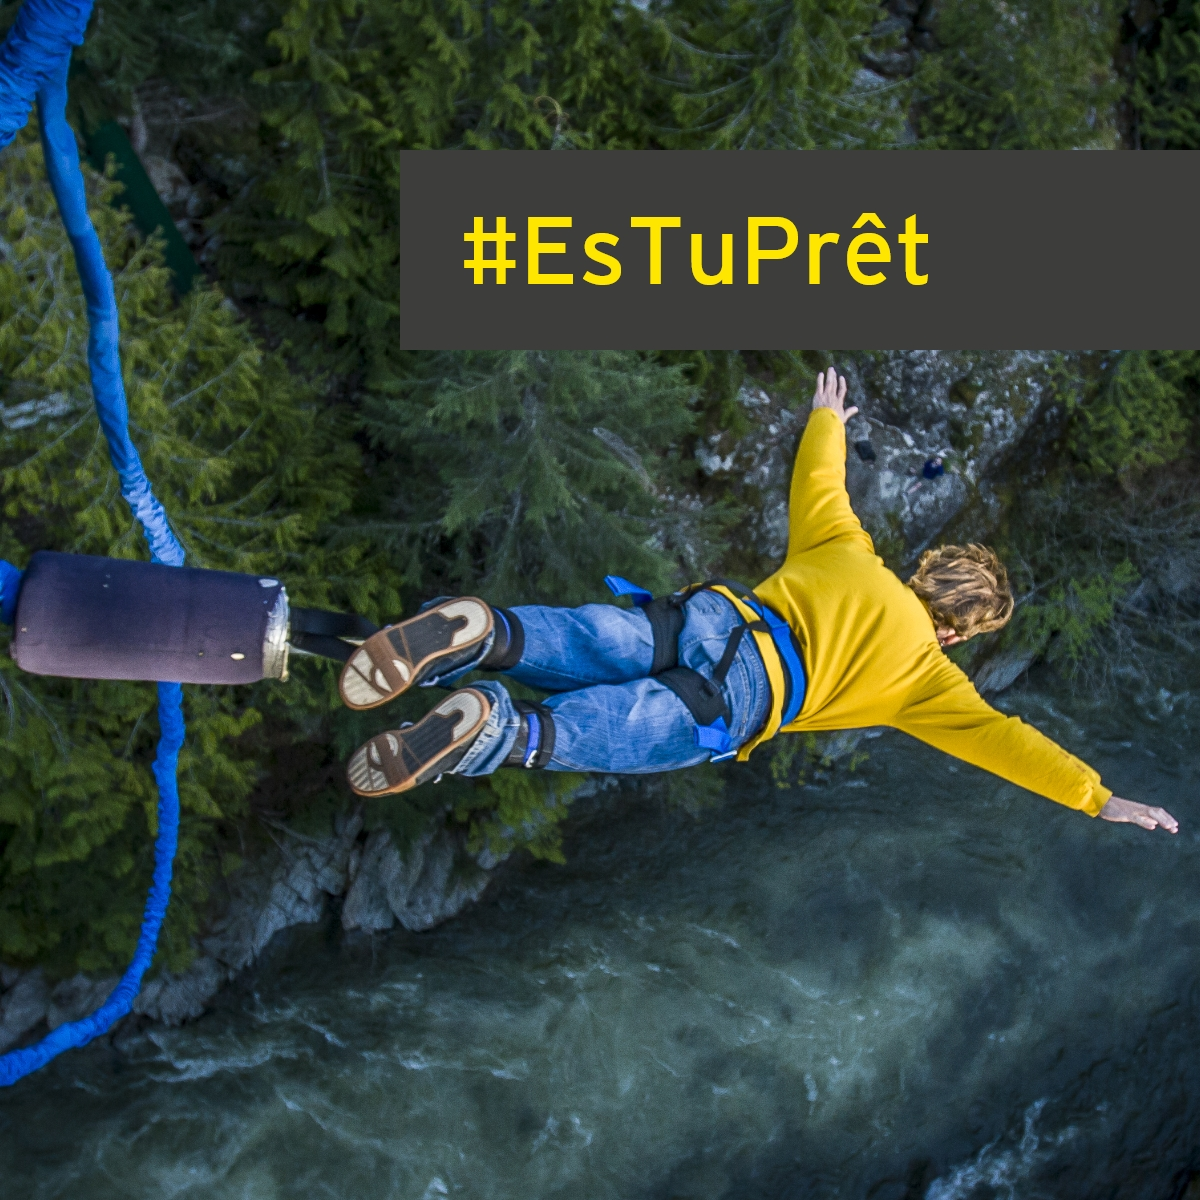 #EsTuPrêt